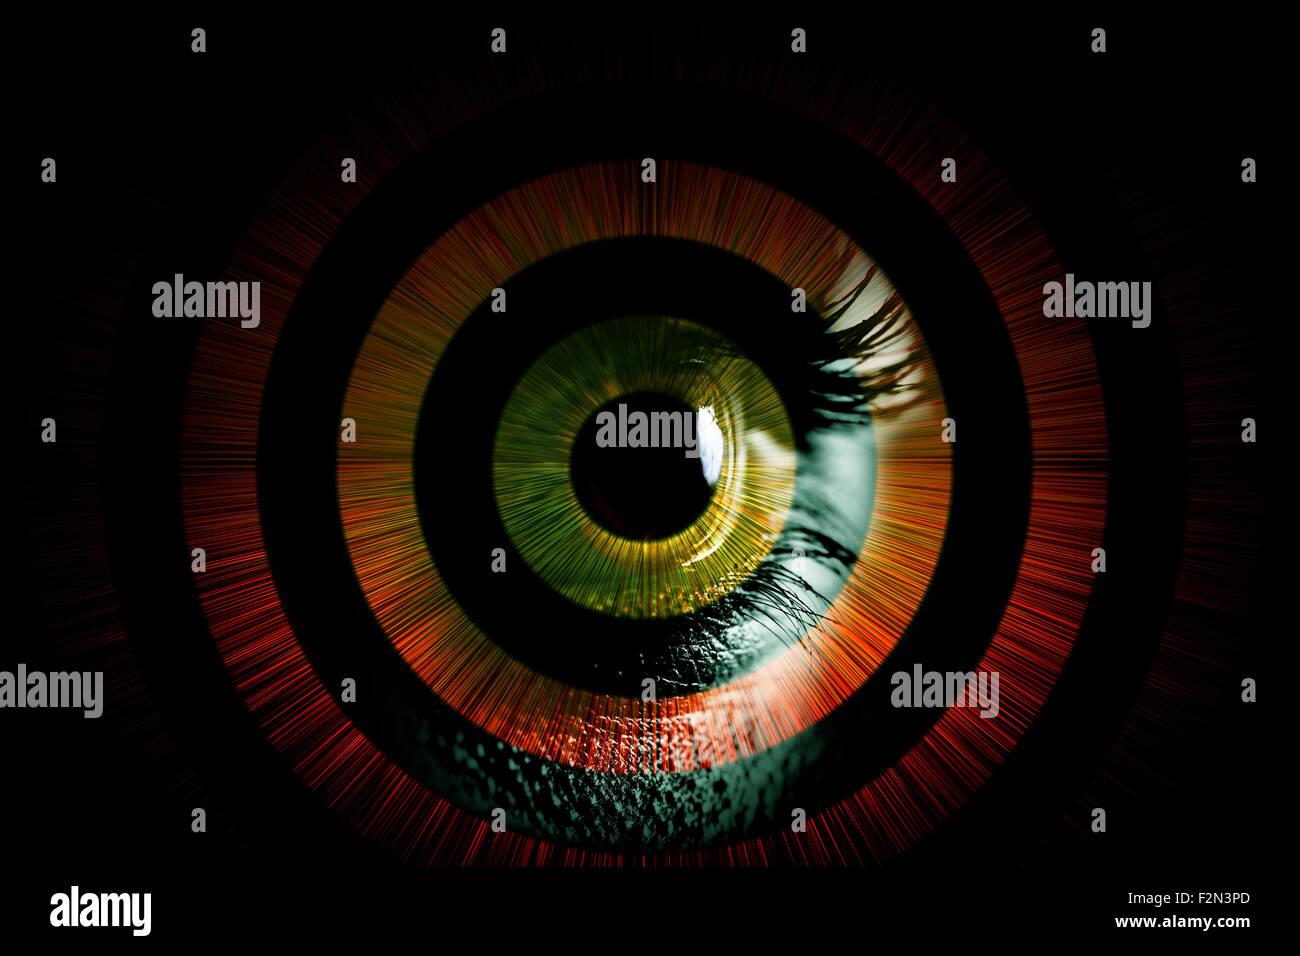 Menschliche Auge ? abstrakte Vision Konzept Stockbild